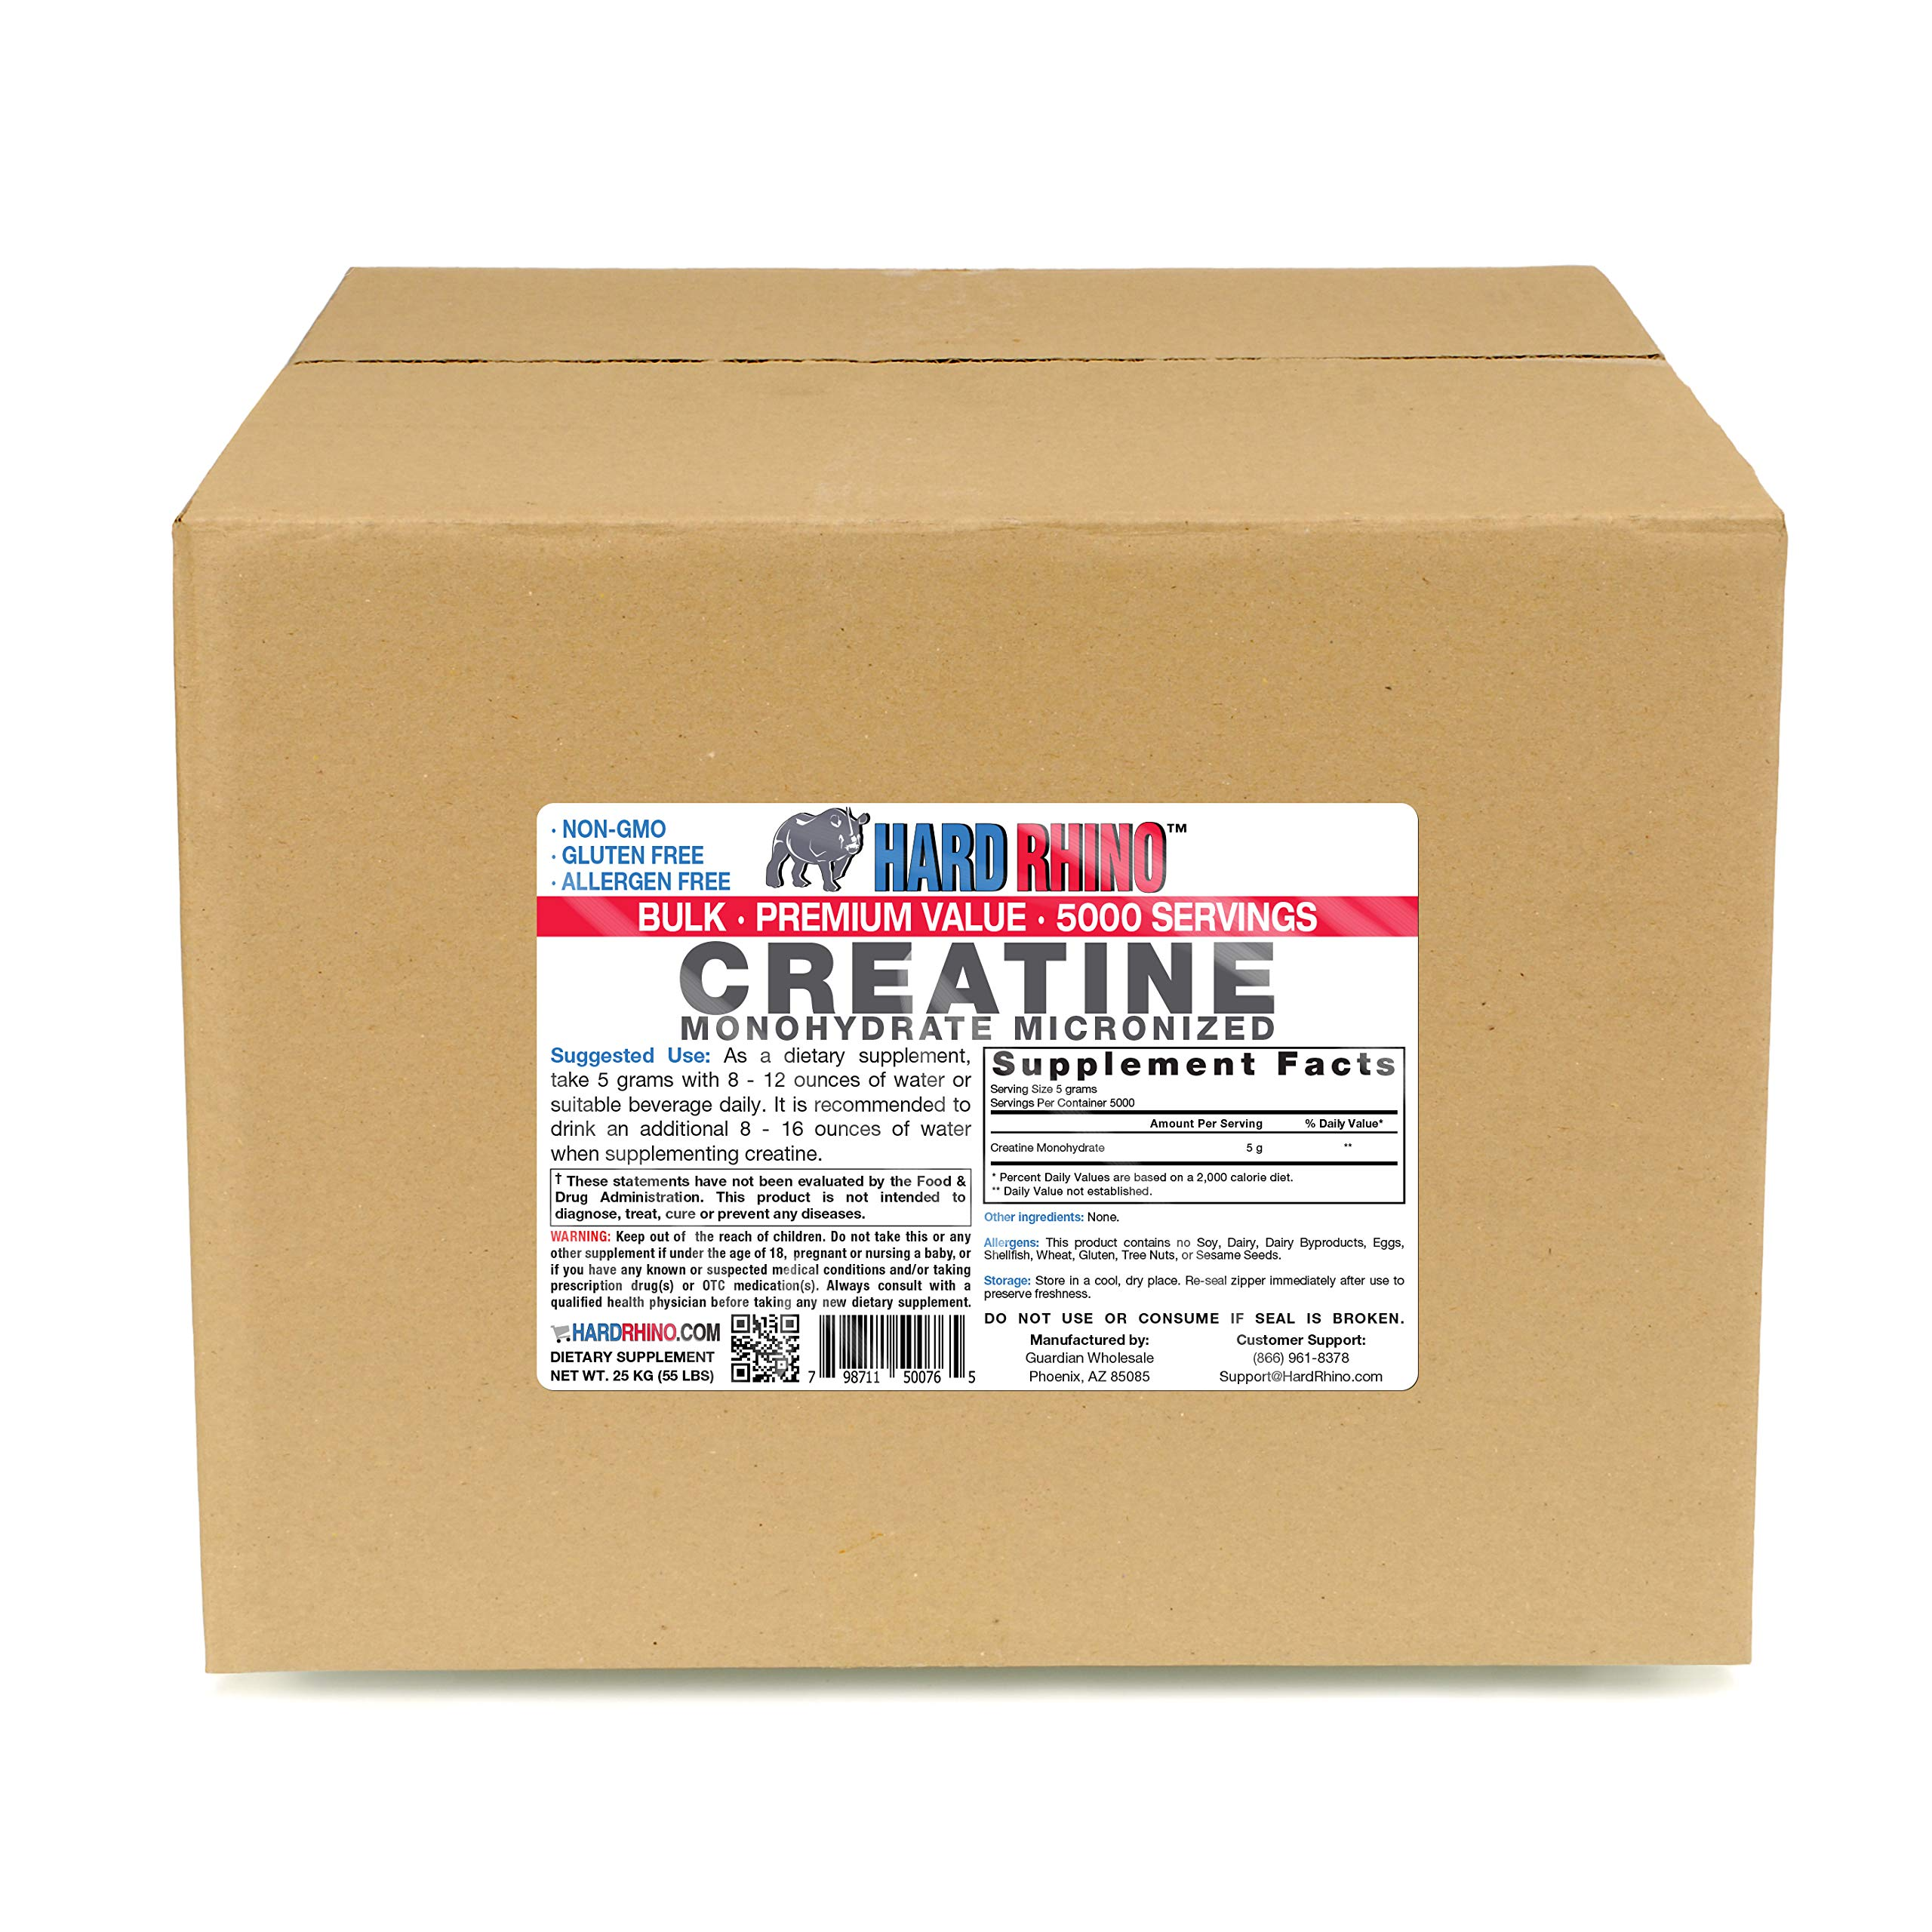 Hard Rhino Creatine Monohydrate Micronized Powder, 25 Kilograms (55 Lbs), Unflavored, Lab-Tested